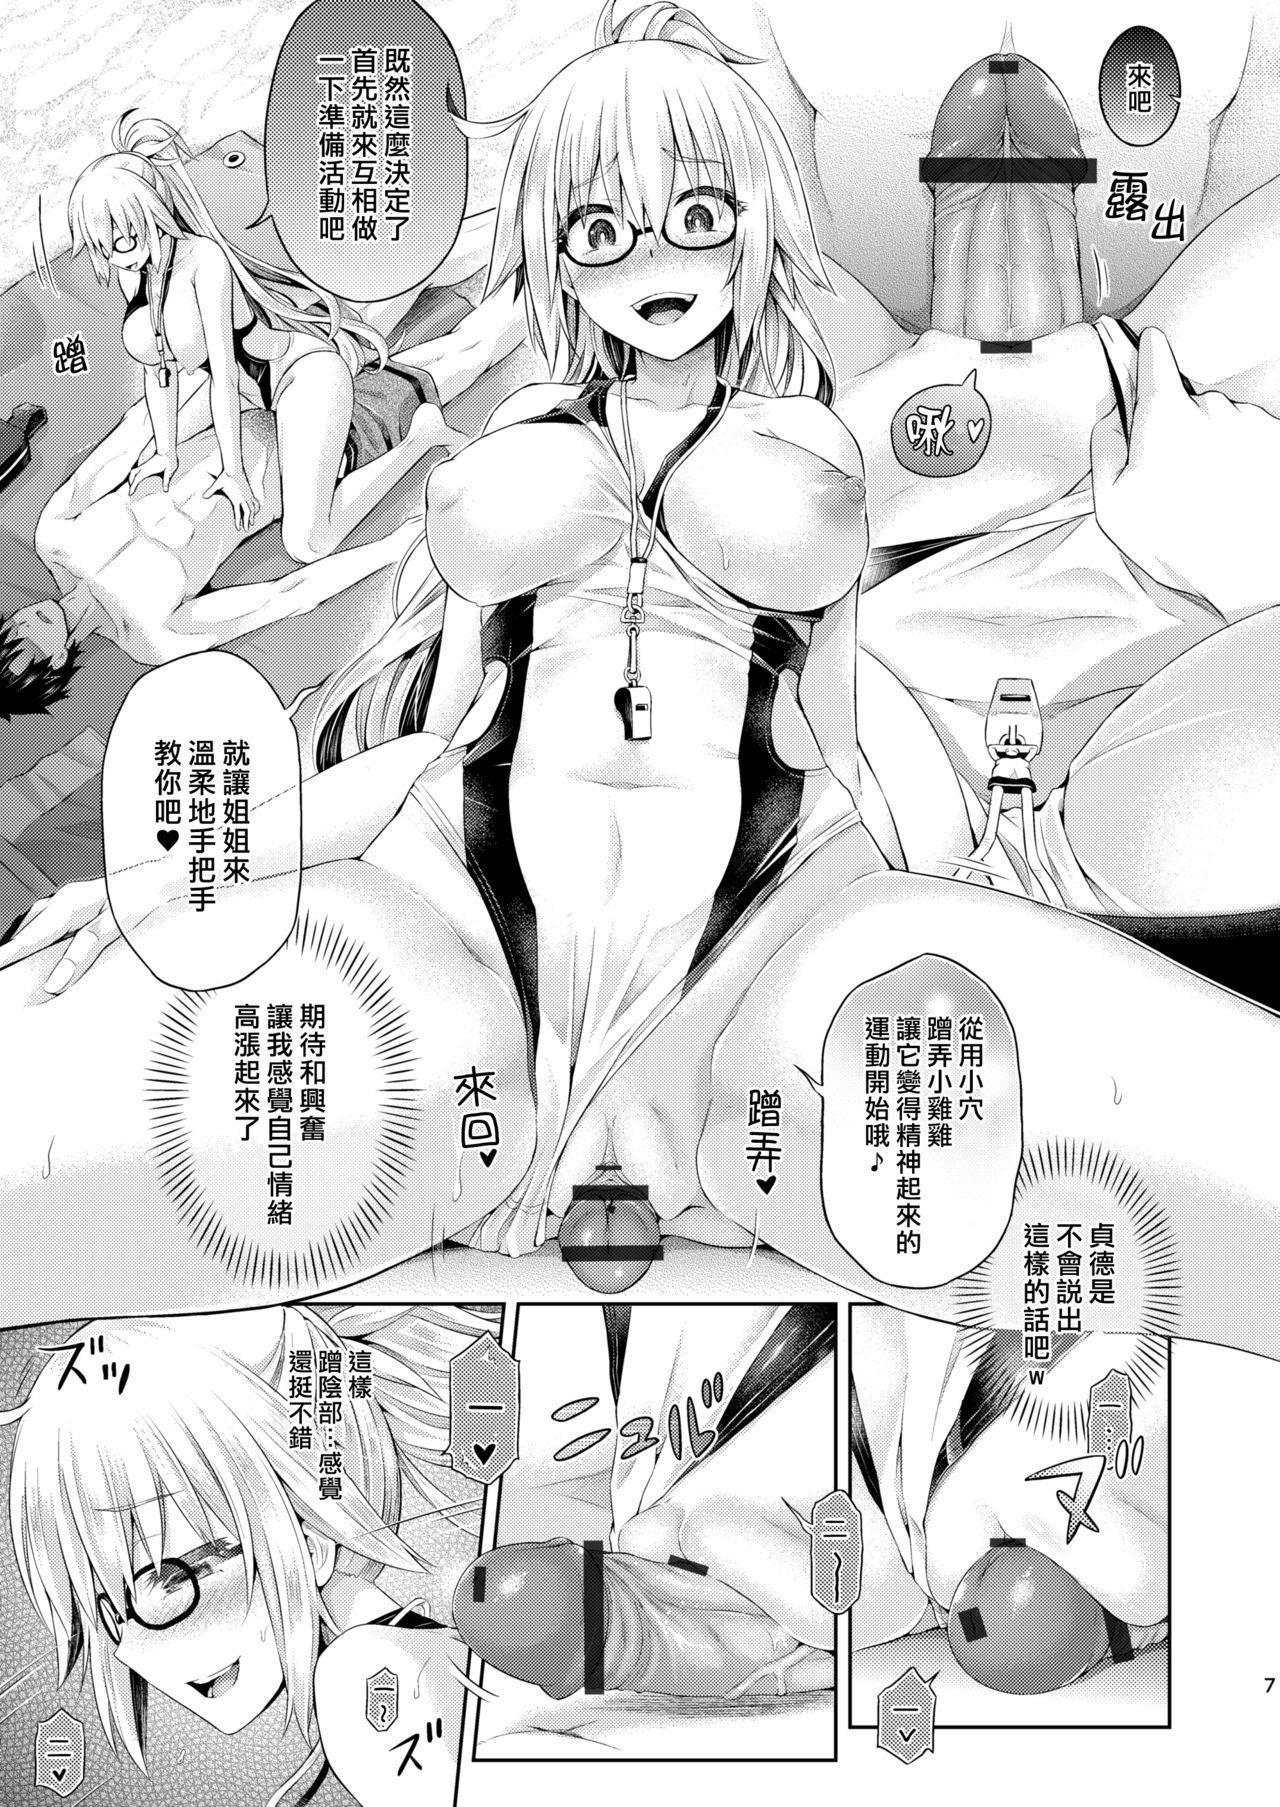 [Dschinghis Khan no Tamanegi wa Ore no Yome (Taniguchi-san)] Kimi -Jeanne d'Arc- ni Naru 2 (Fate/Grand Order) [Chinese] [熊崎玉子汉化组] [Digital] 7